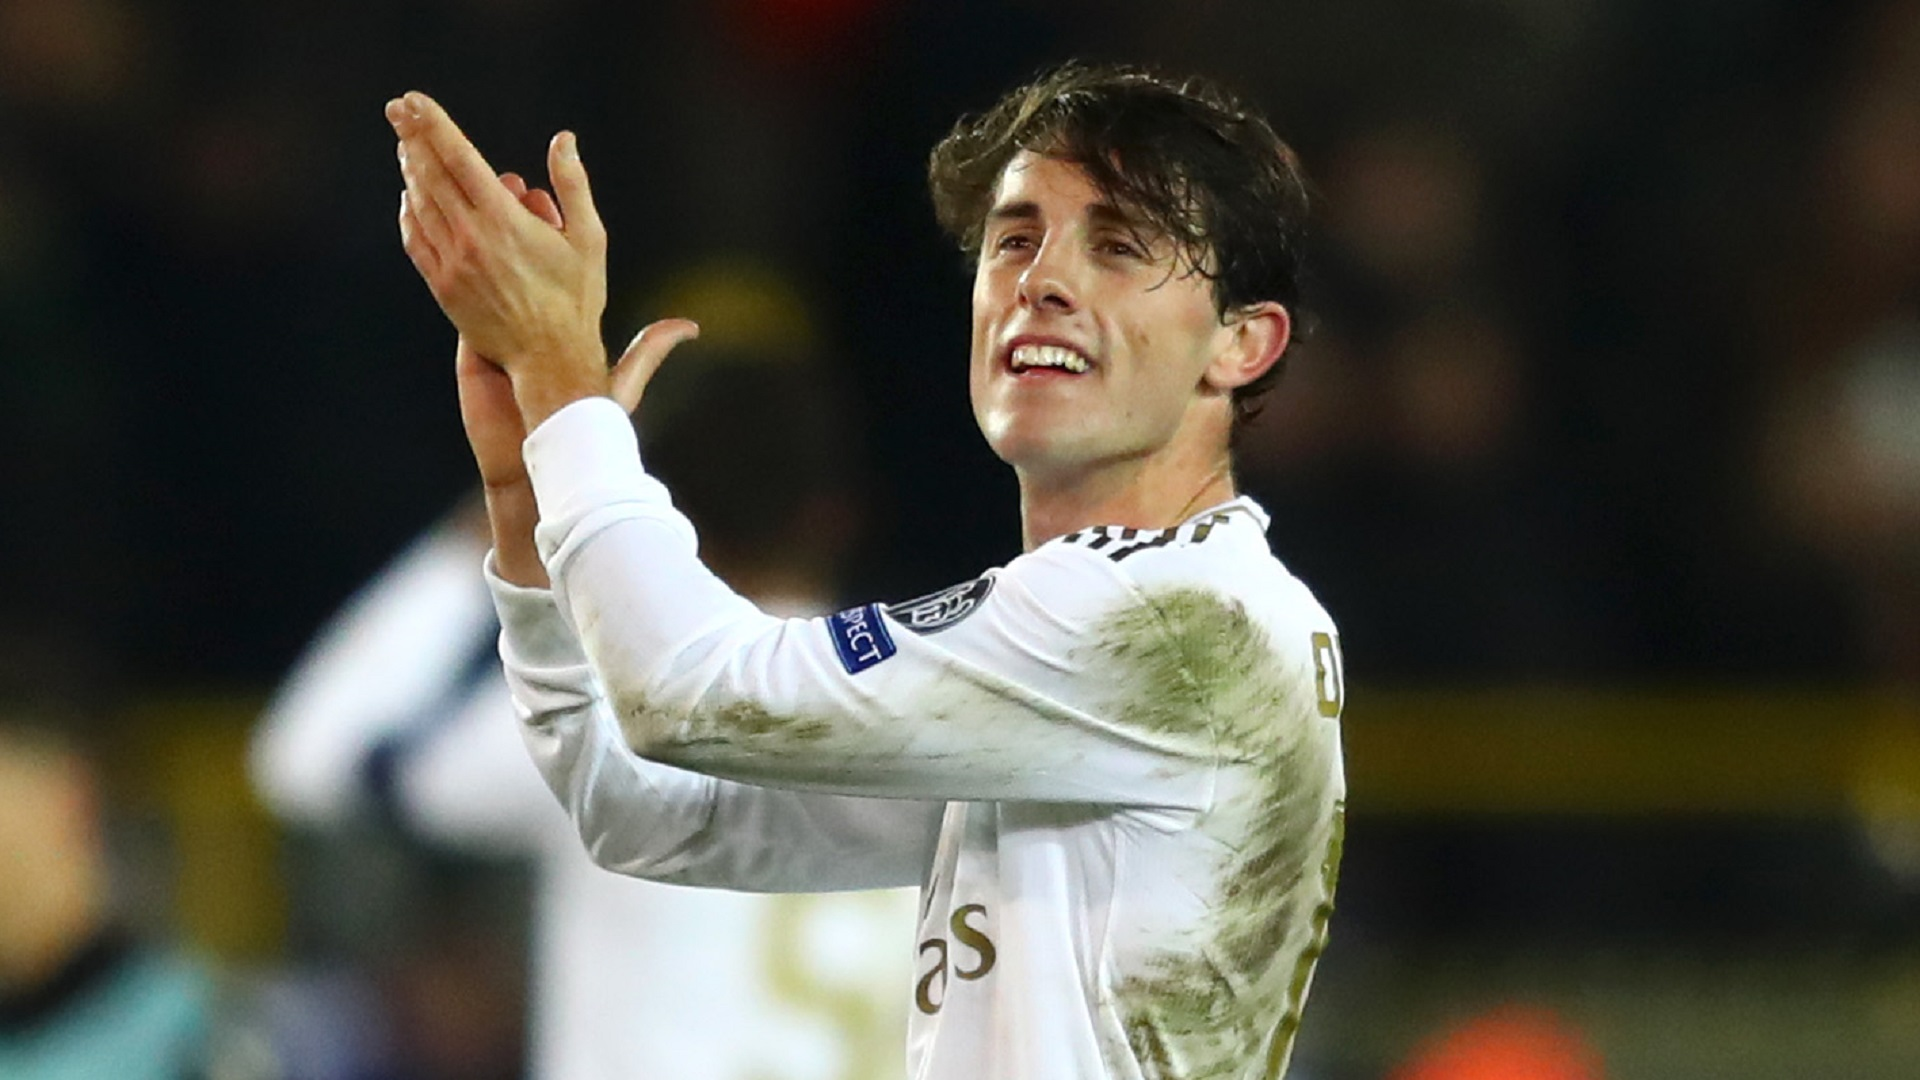 Championnat d'Espagne : Odriozola (Real Madrid) prêté au Bayern